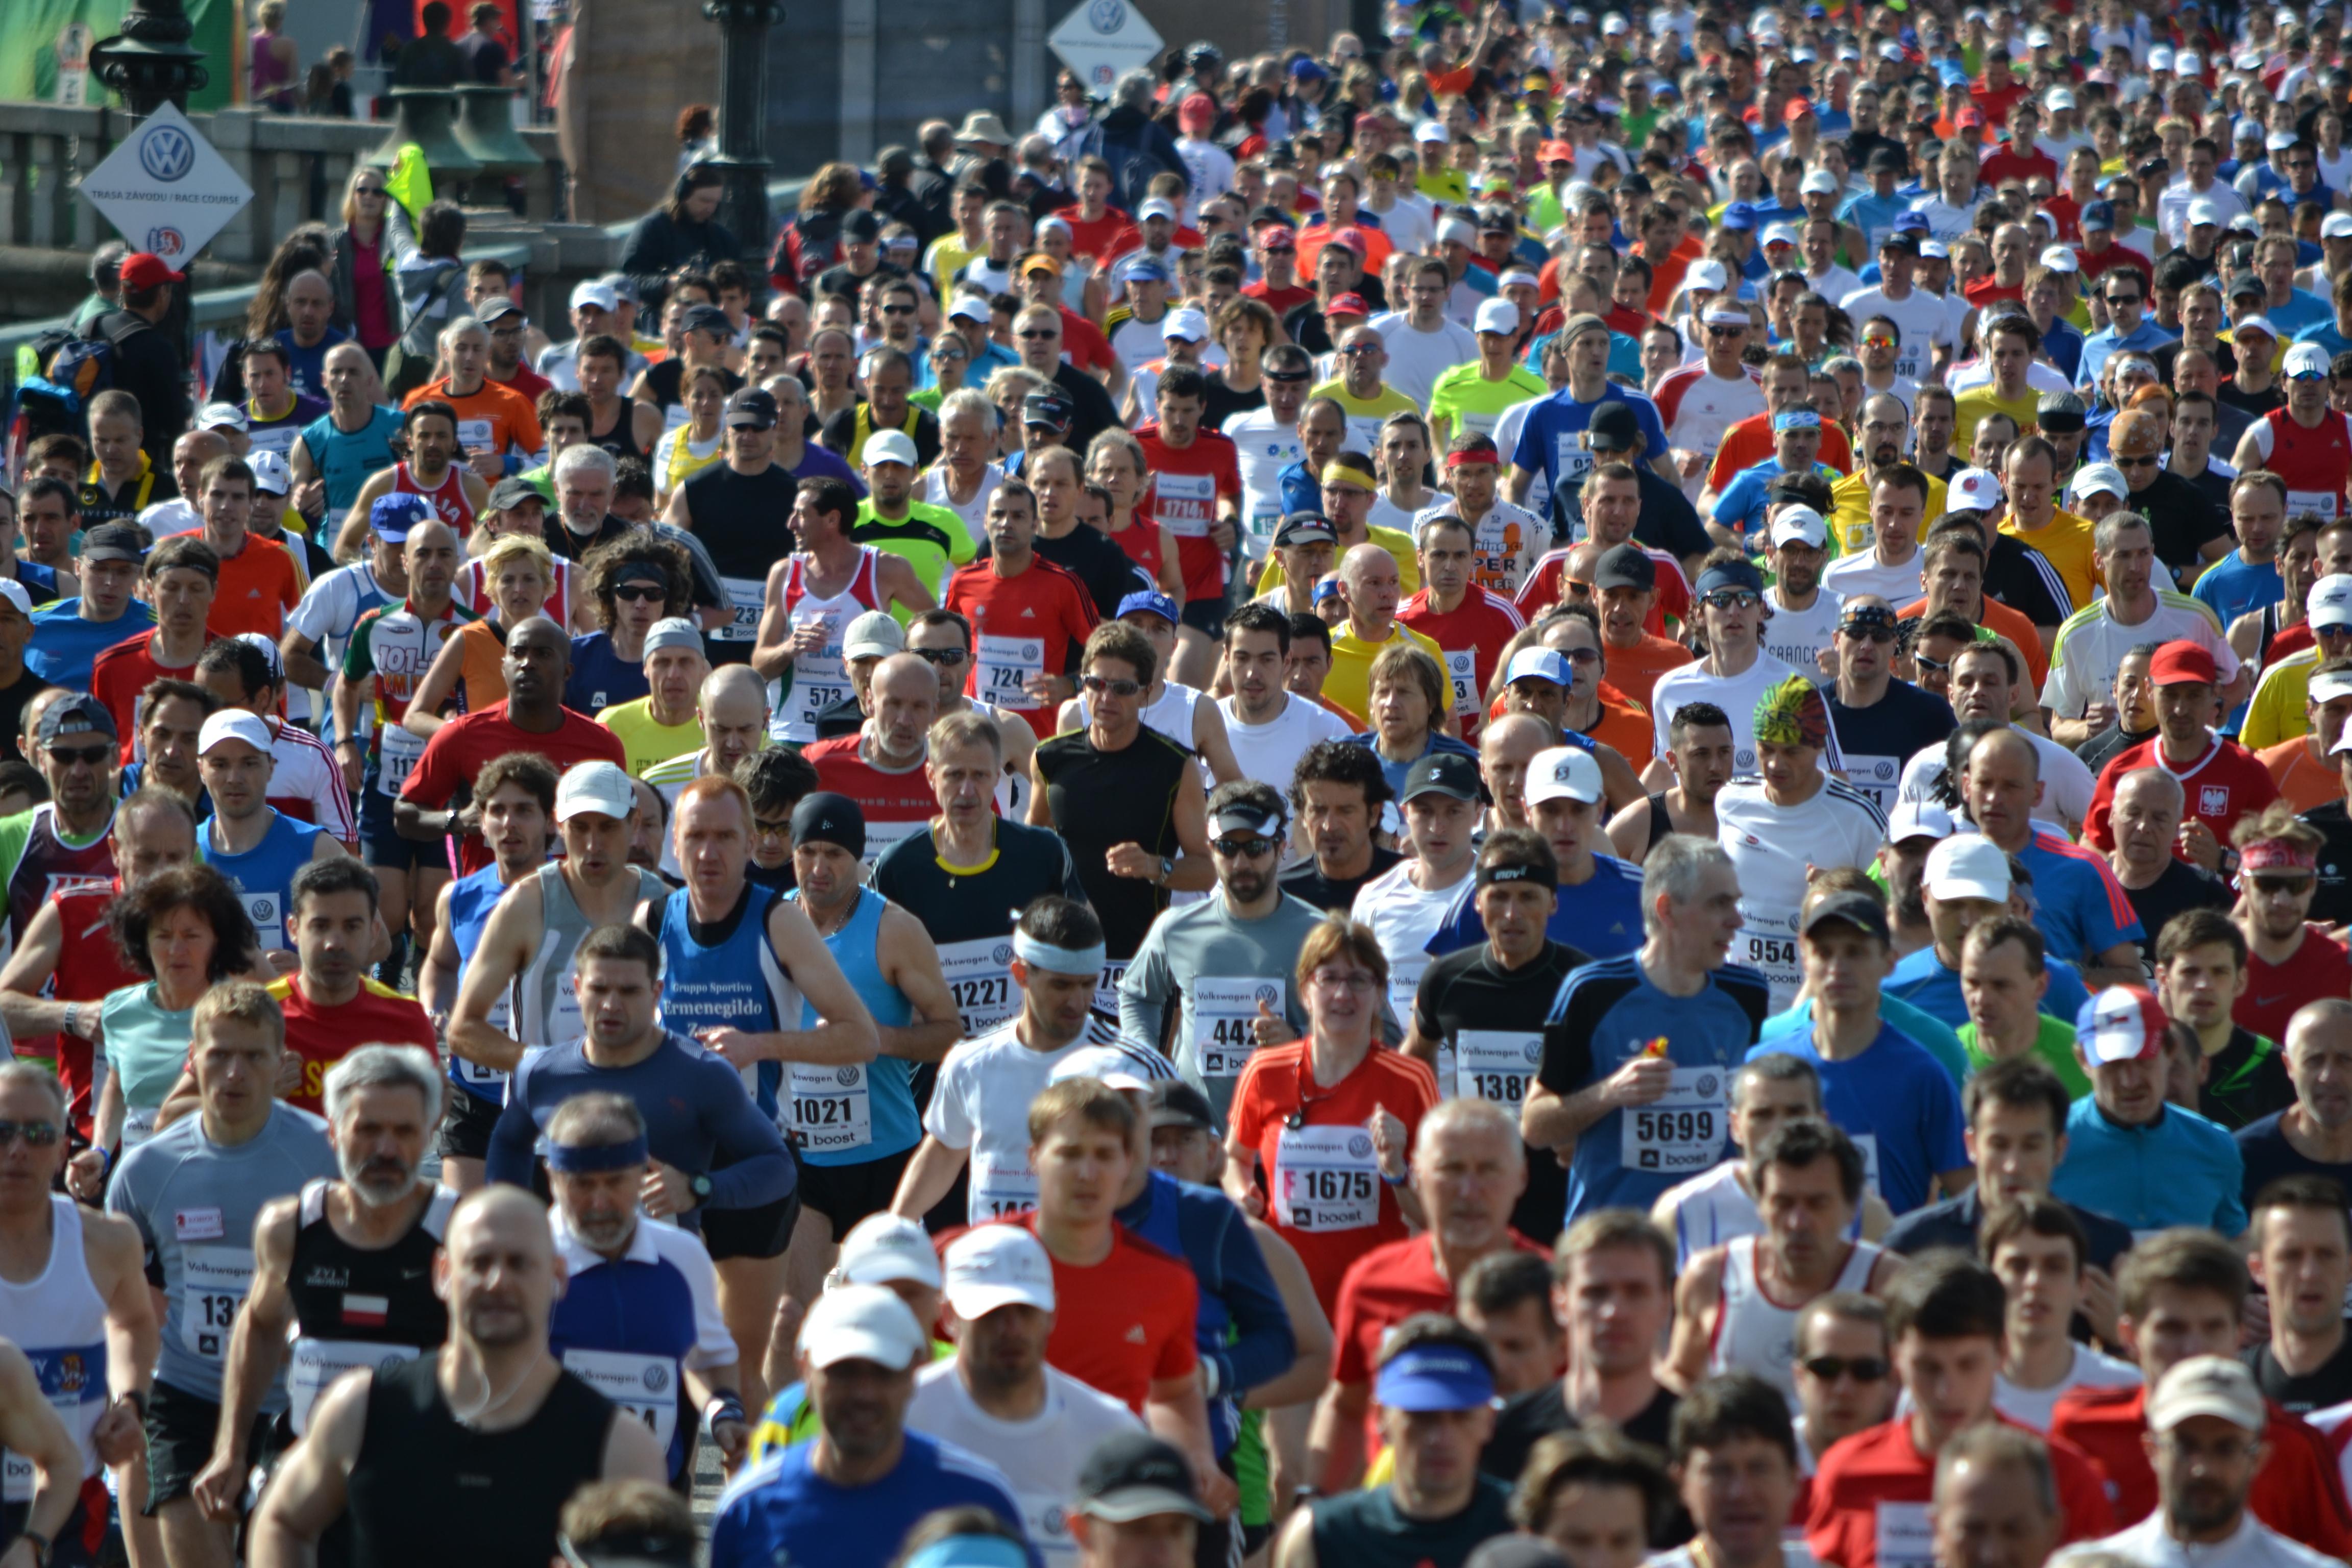 File:Prague Marathon 2013.JPG - Wikimedia Commons